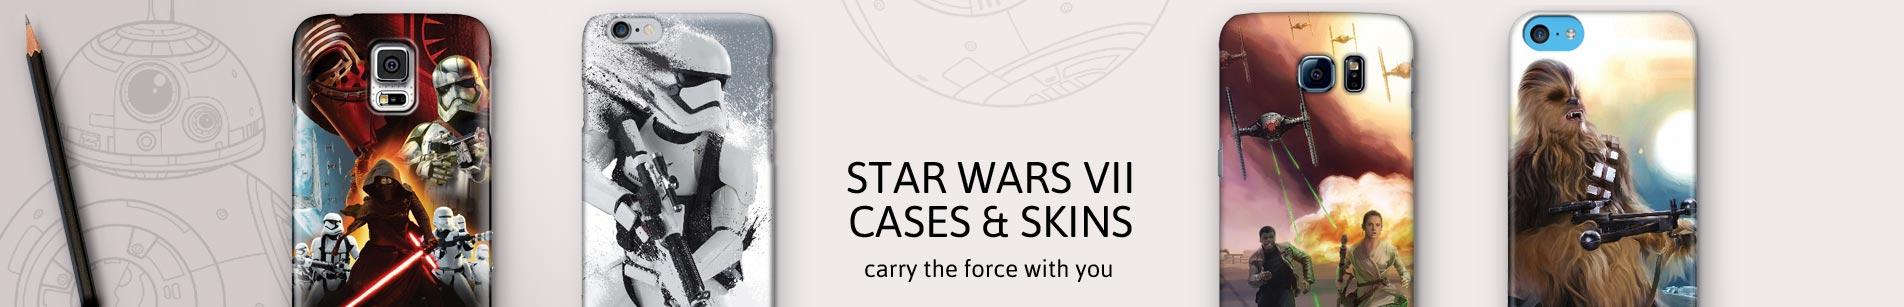 star wars phone skins